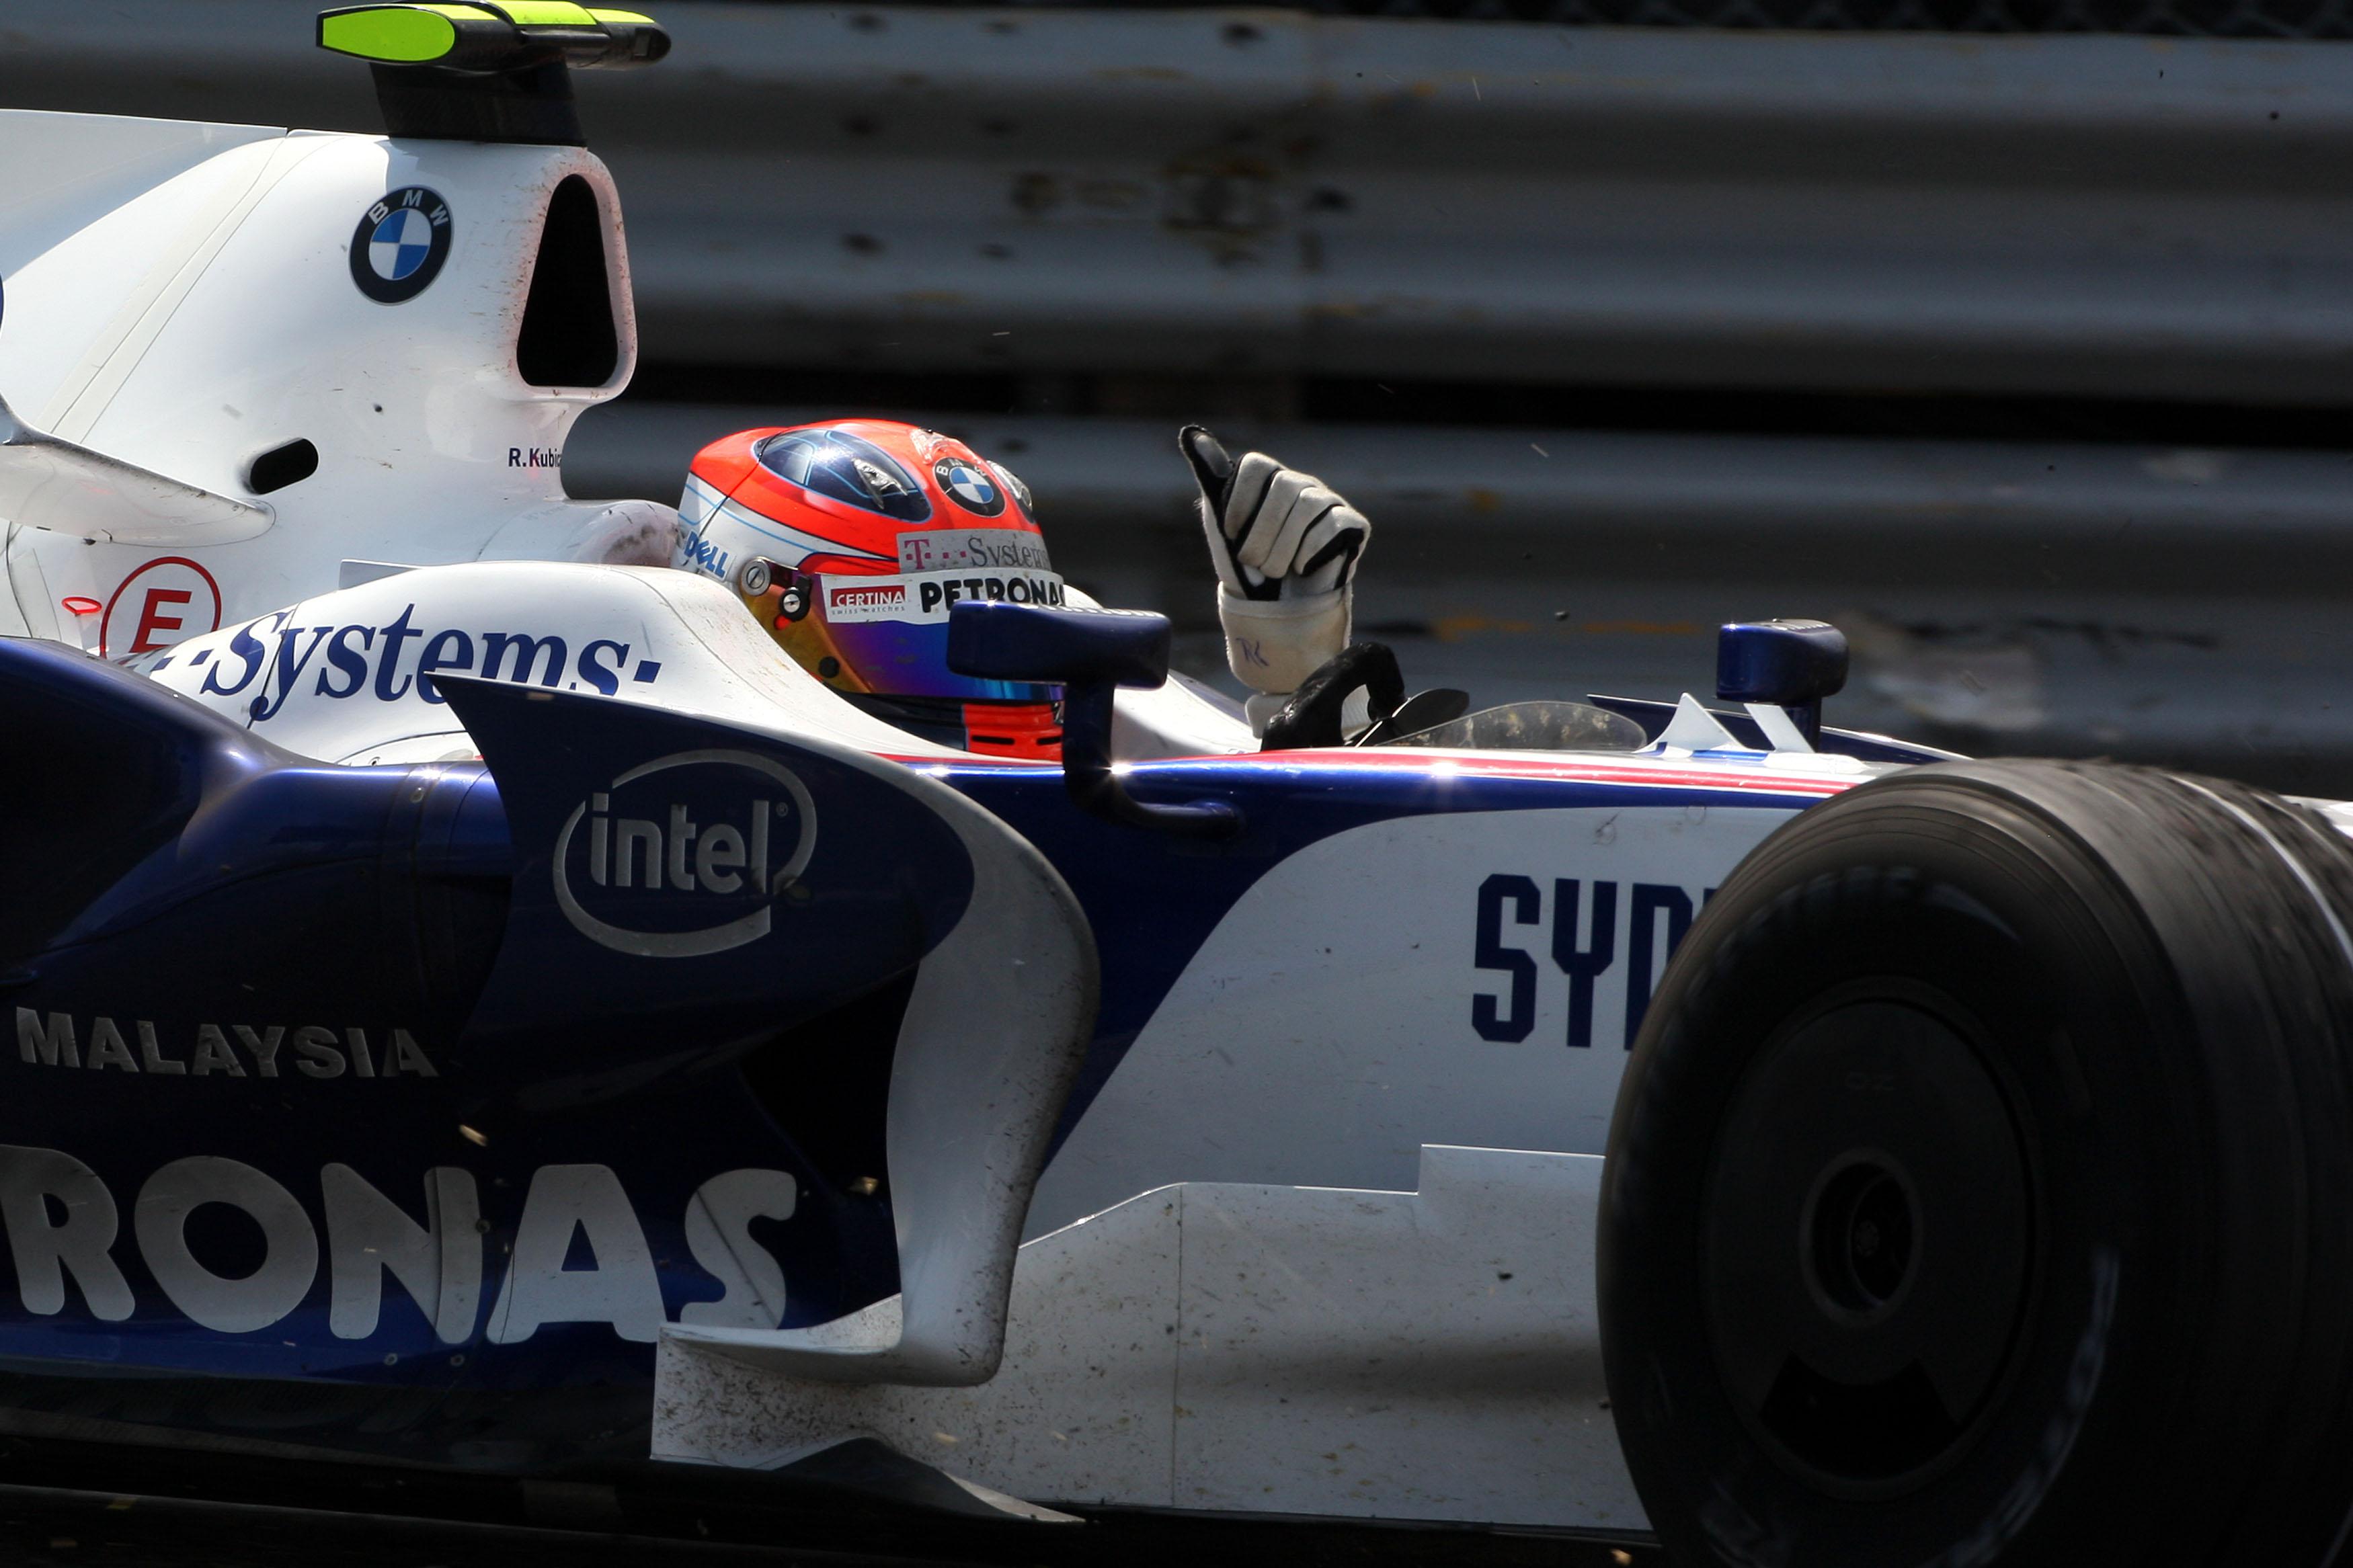 Robert Kubica, 2008 Canadian GP winner, BMW Sauber, F1